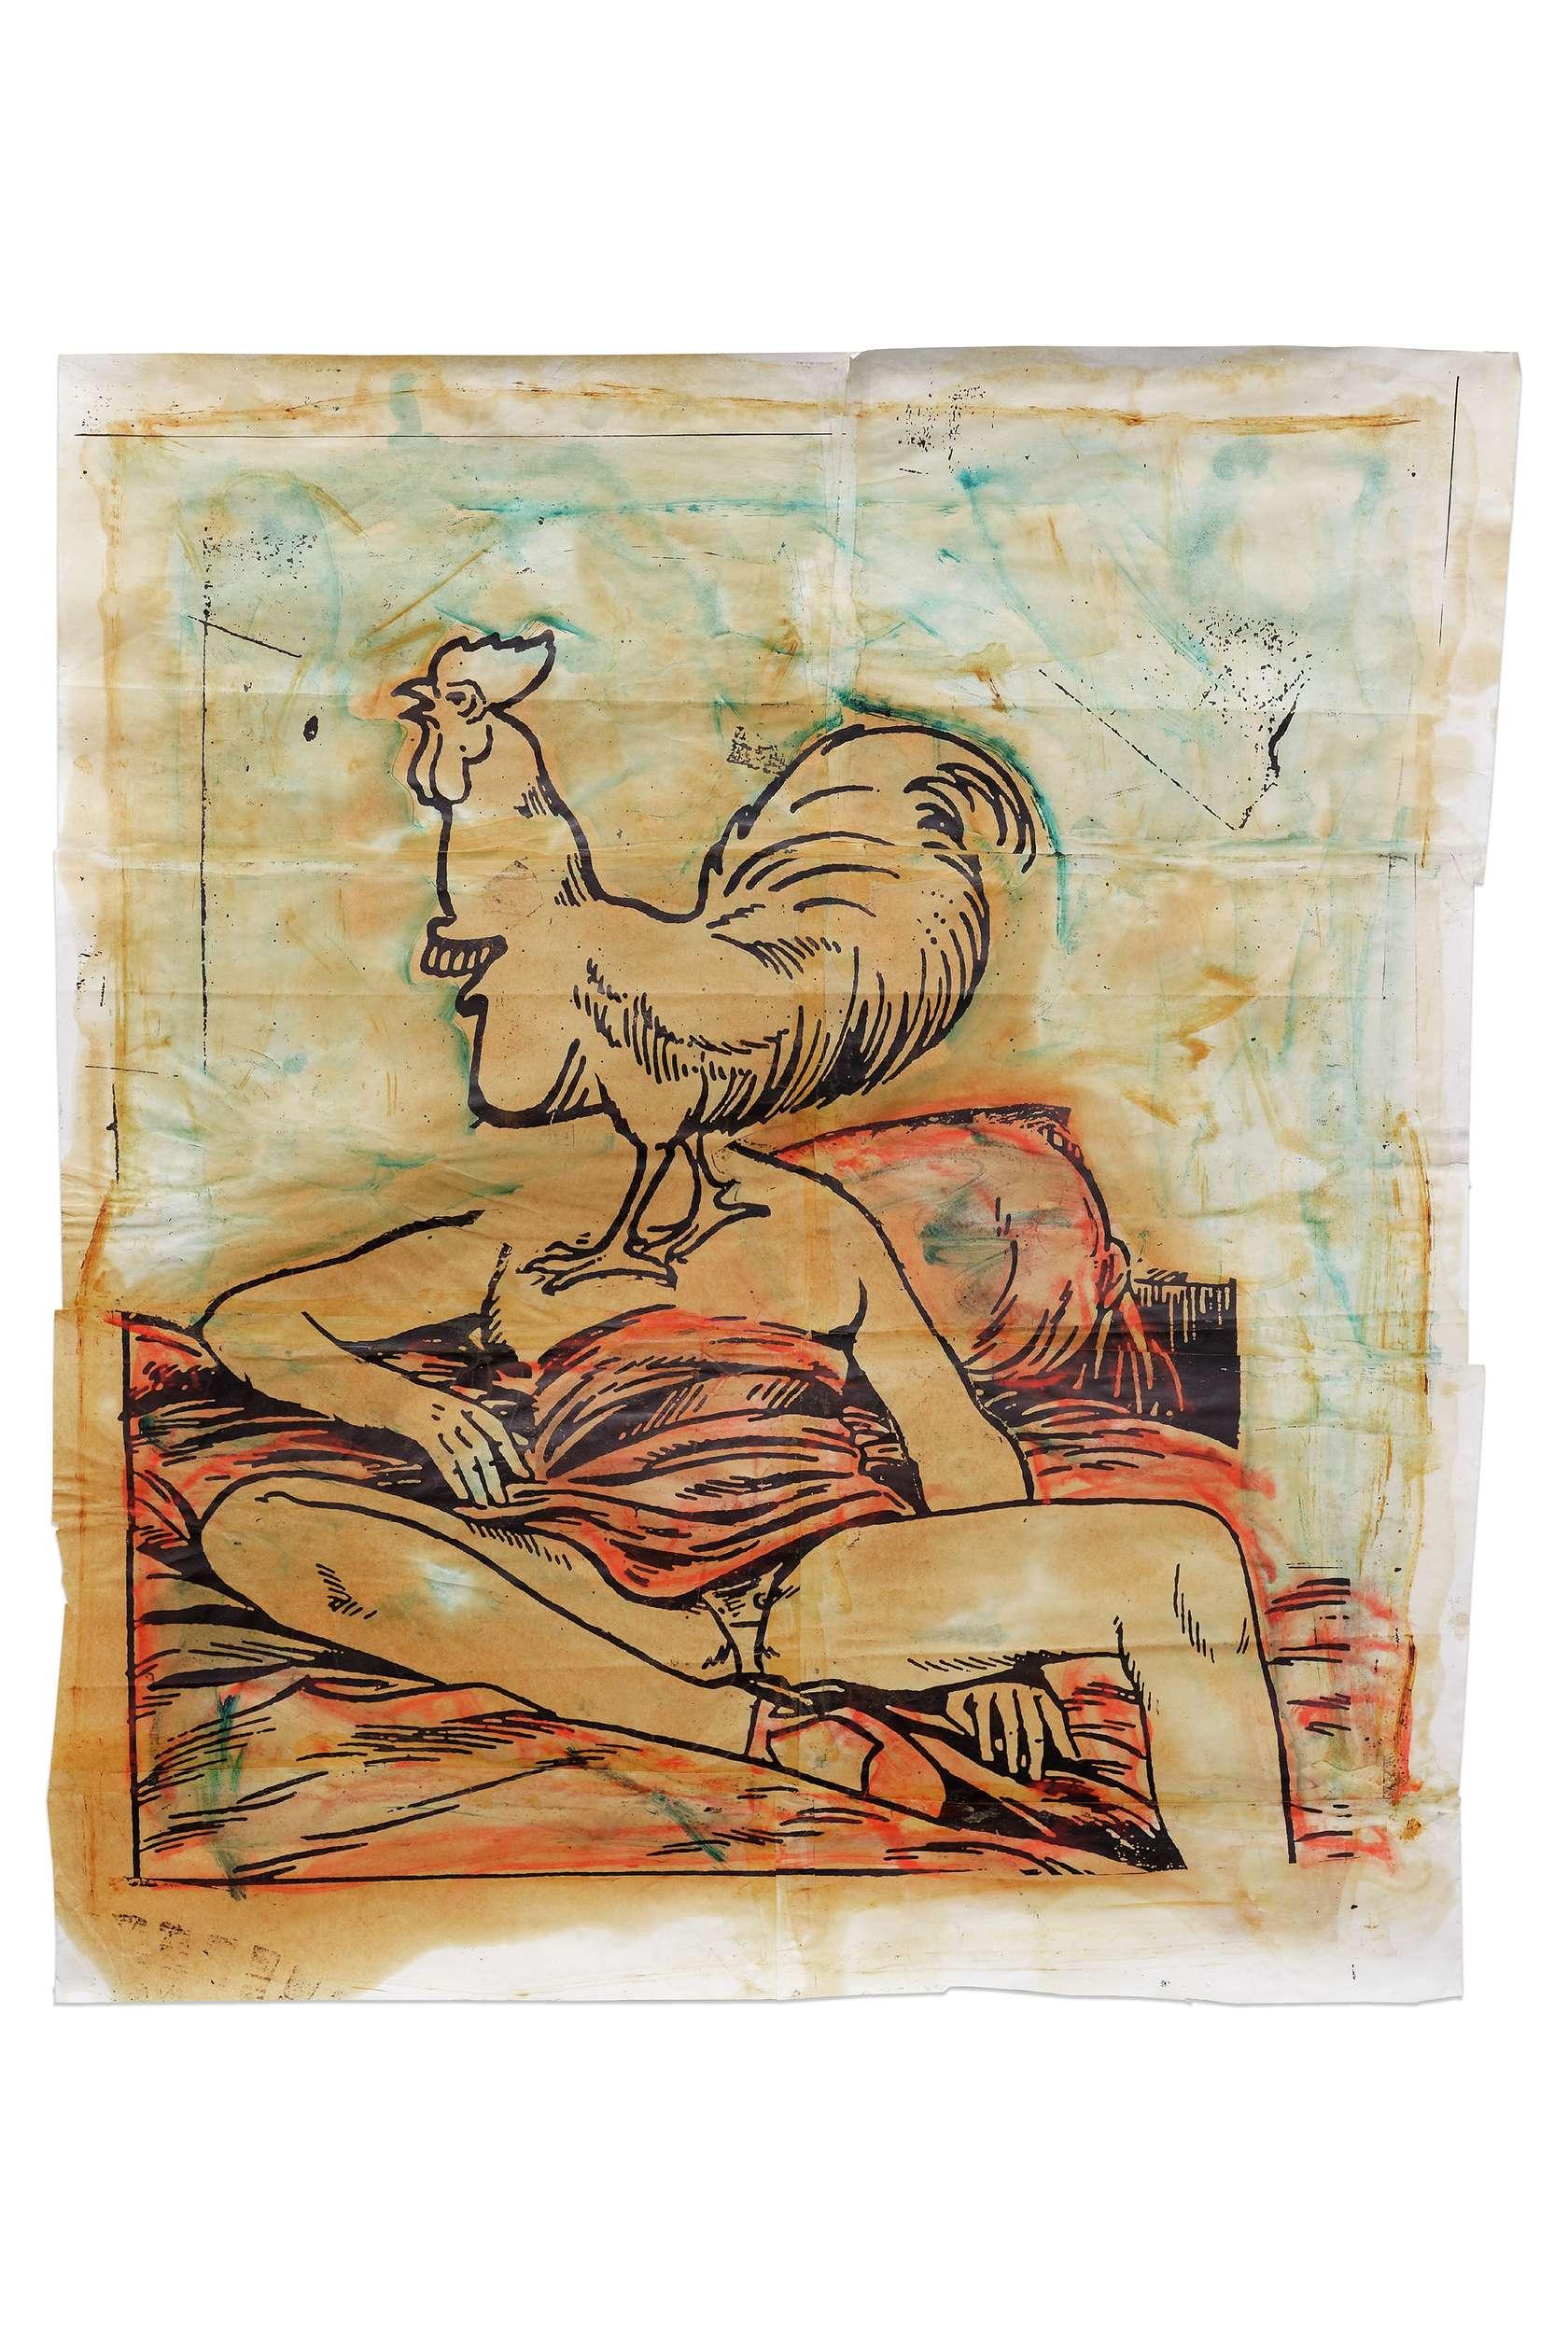 Steve Gianakos, She sang to rare reggae, 2005 Techniques mixtes sur papier87 x 76 cm / 34 1/4 x 29 7/8 inches